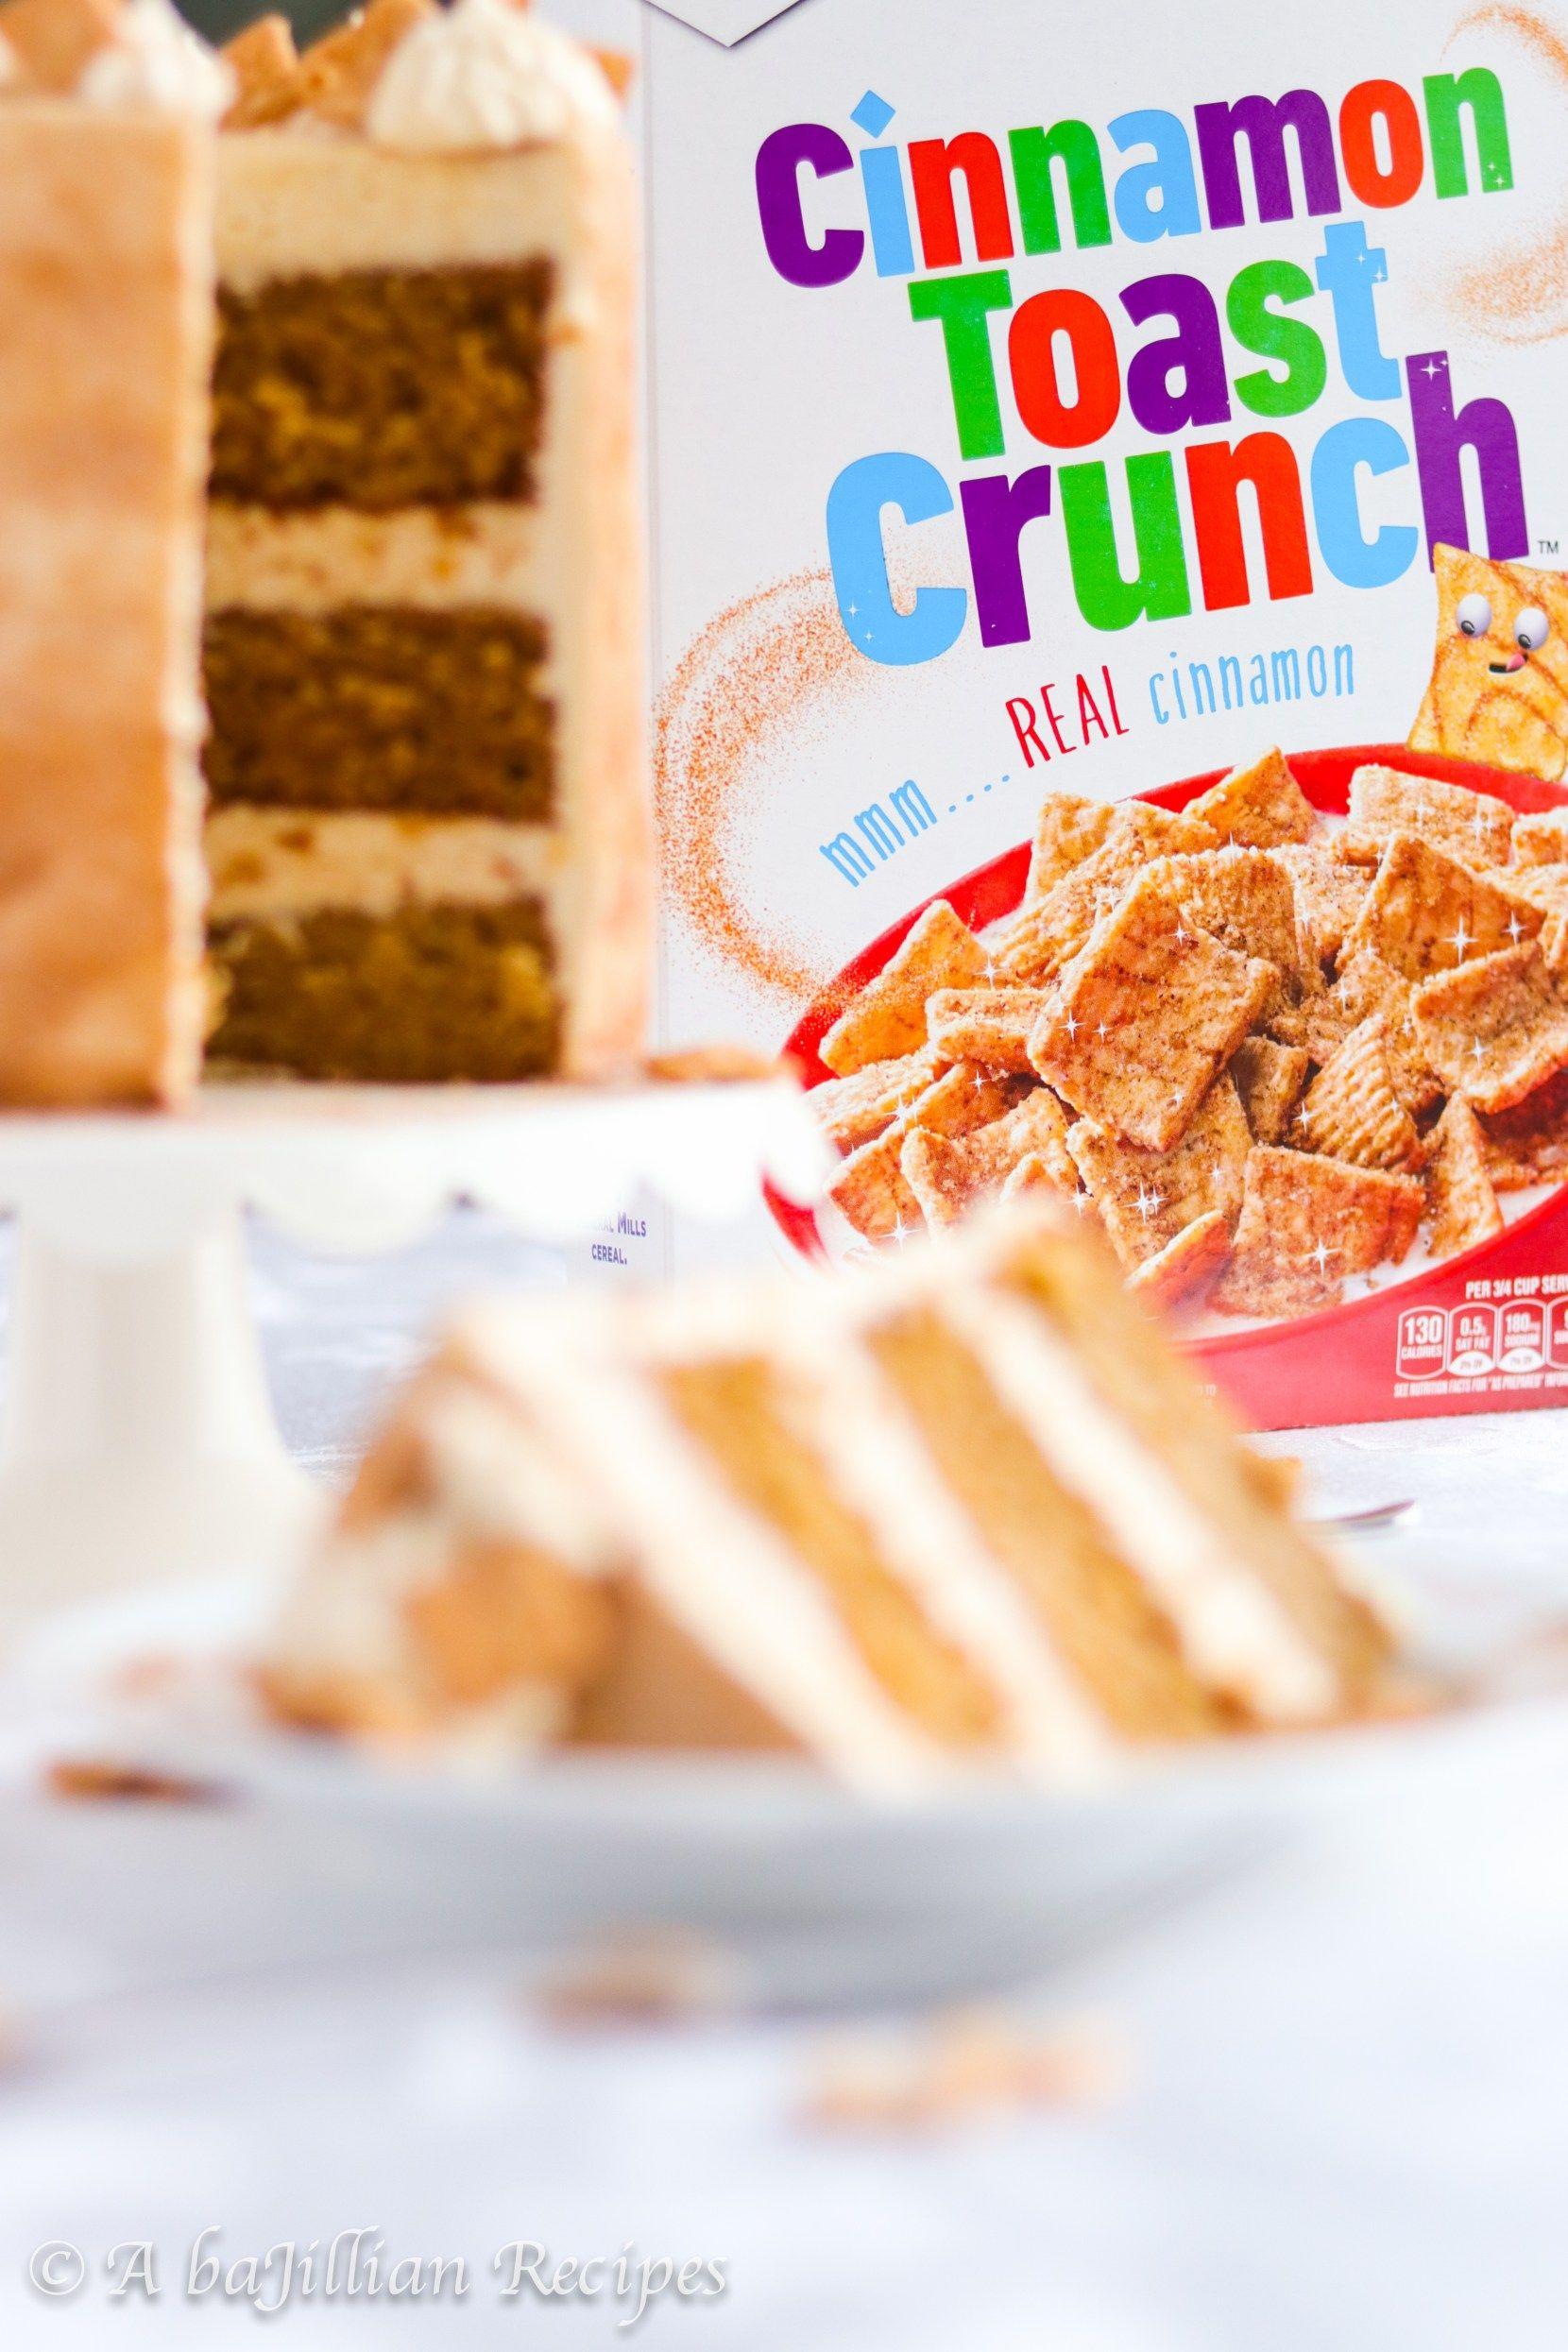 Cinnamon toast crunch cake in 2020 cinnamon toast crunch